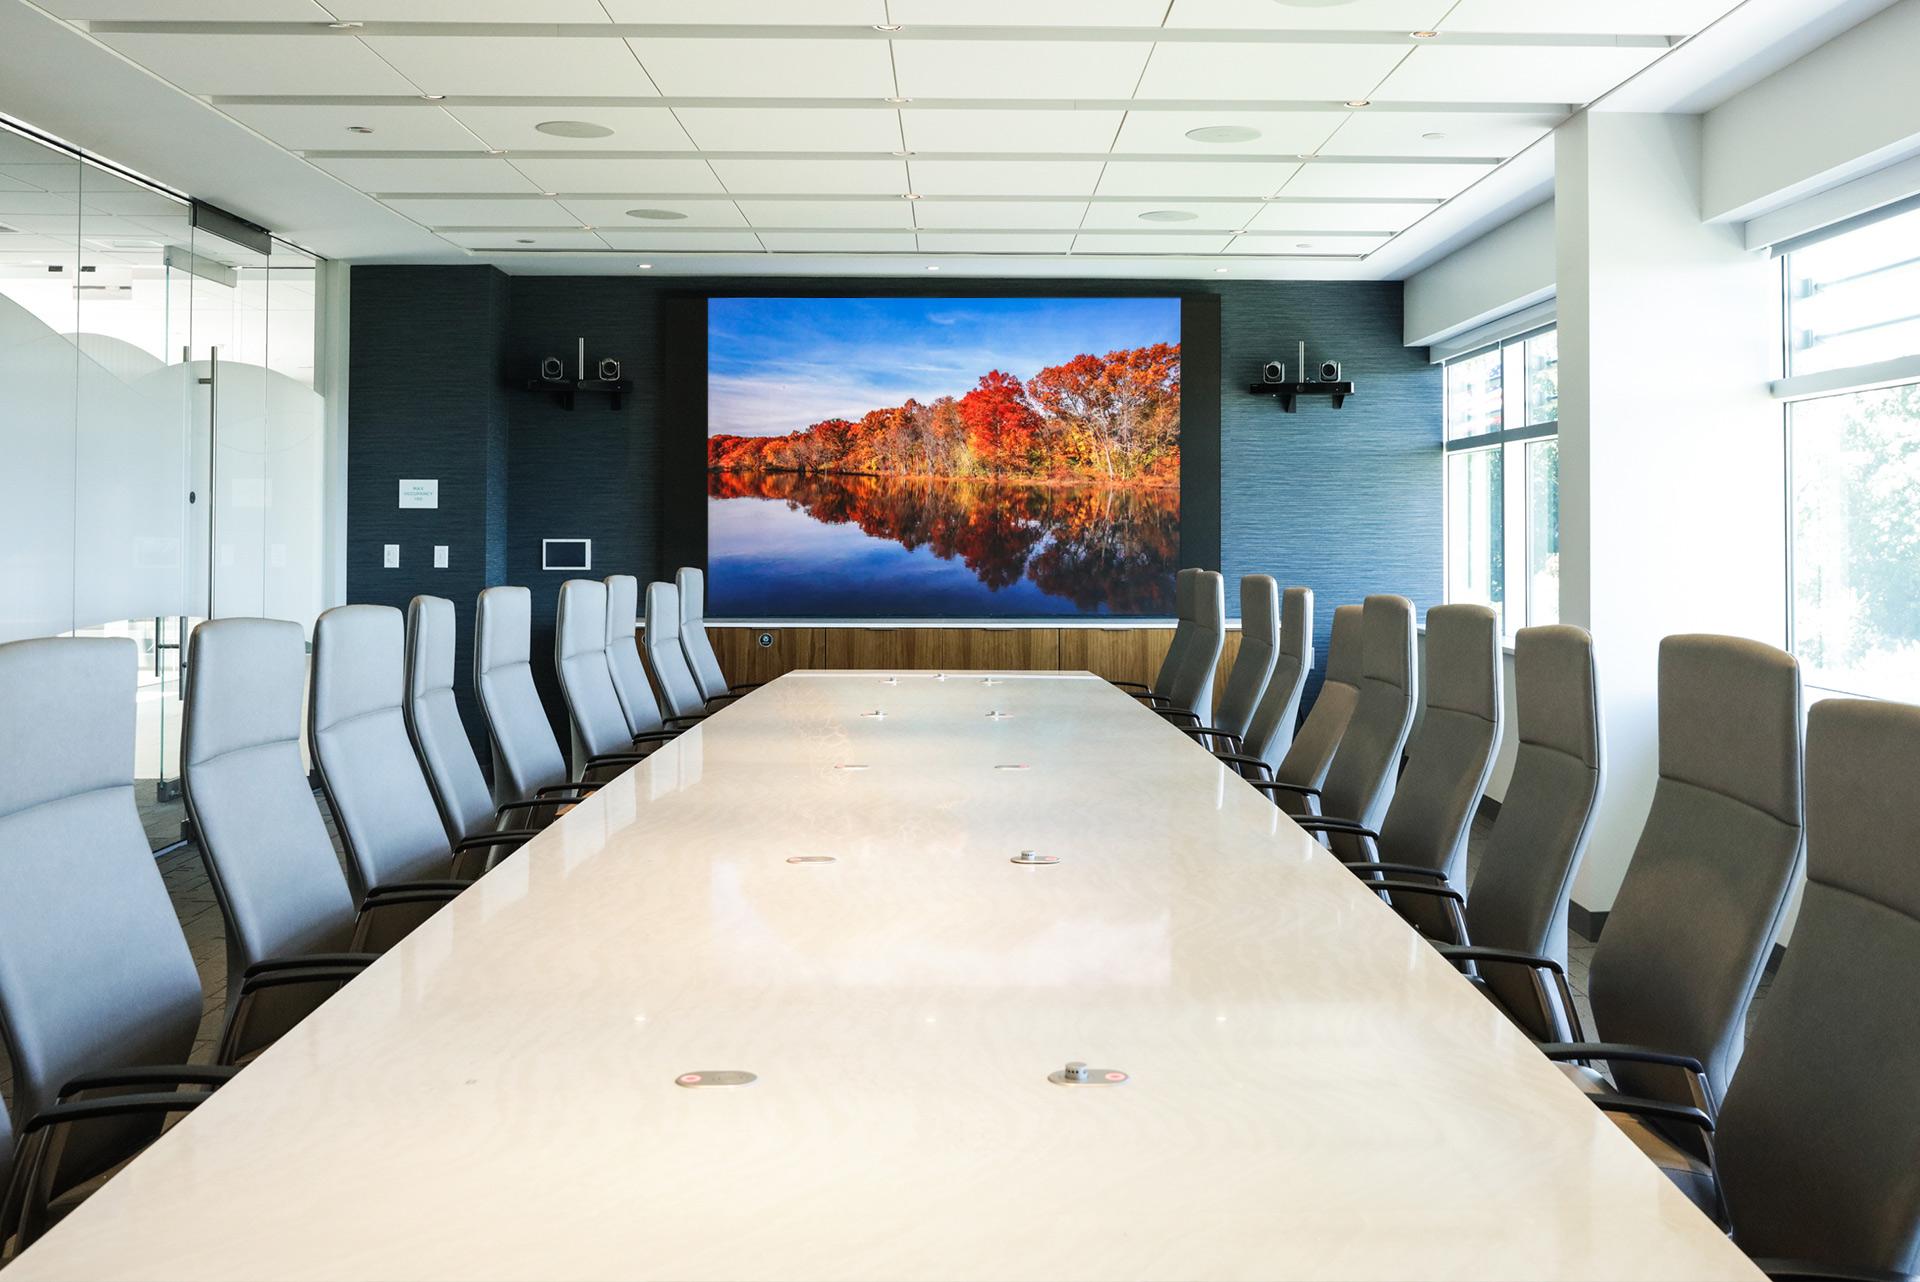 Cambridge Savings Bank Executive Boardroom Image